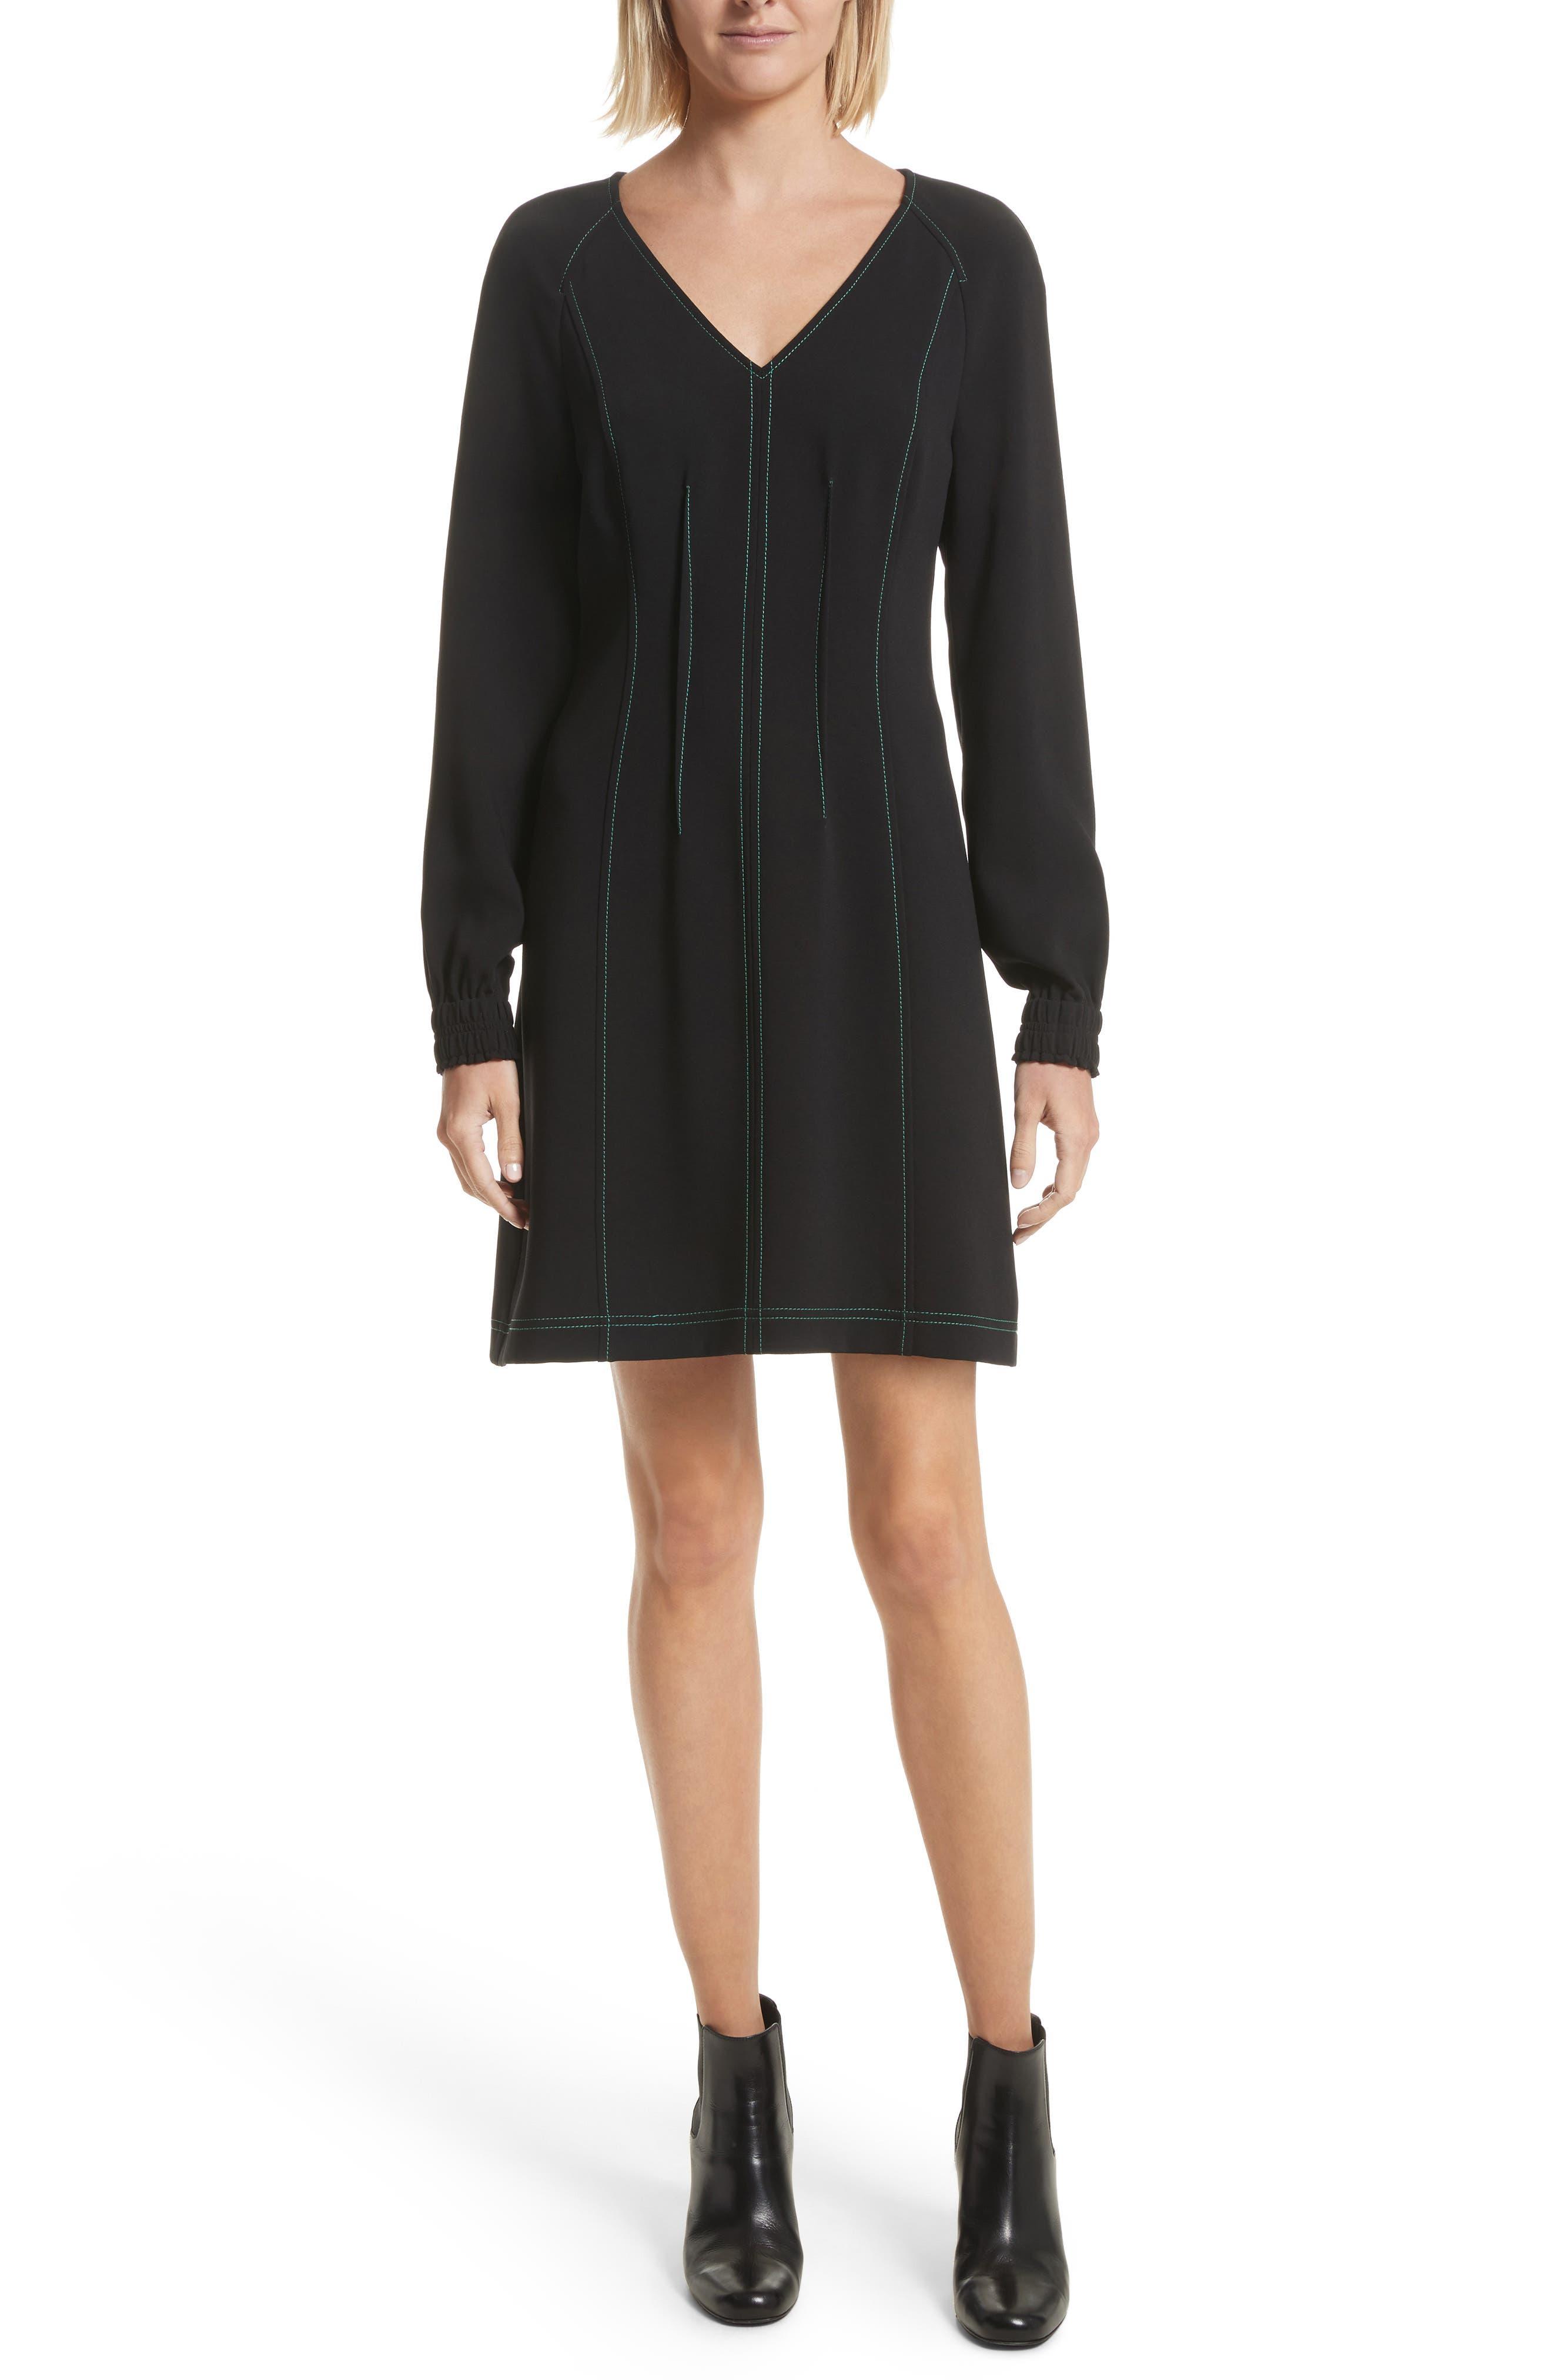 Alternate Image 1 Selected - GREY Jason Wu Contrast Stitch Dress